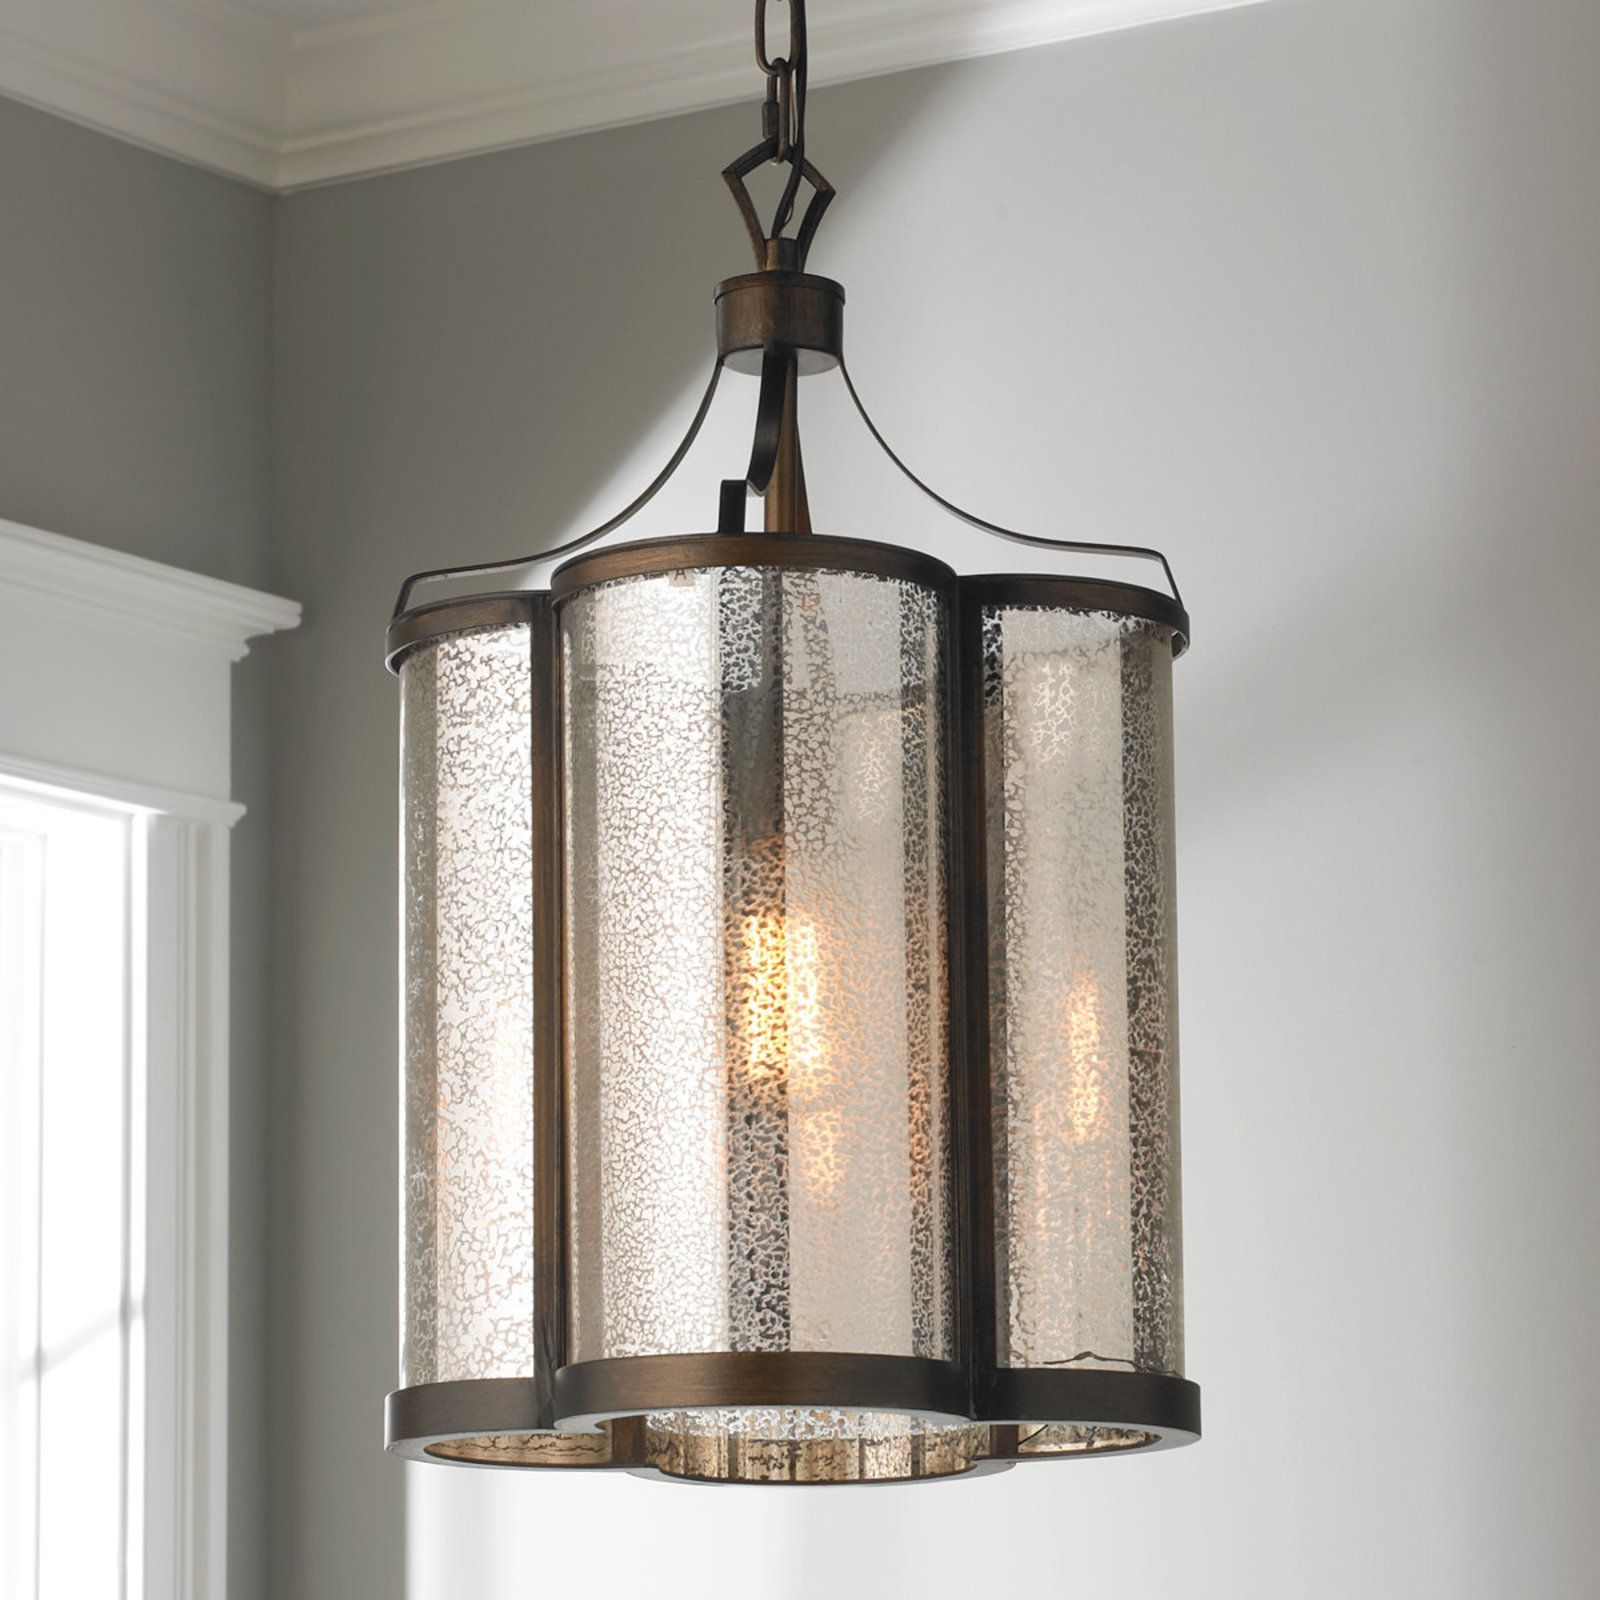 mercury glass pendant lighting. Scalloped Mercury Glass Pendant Lighting